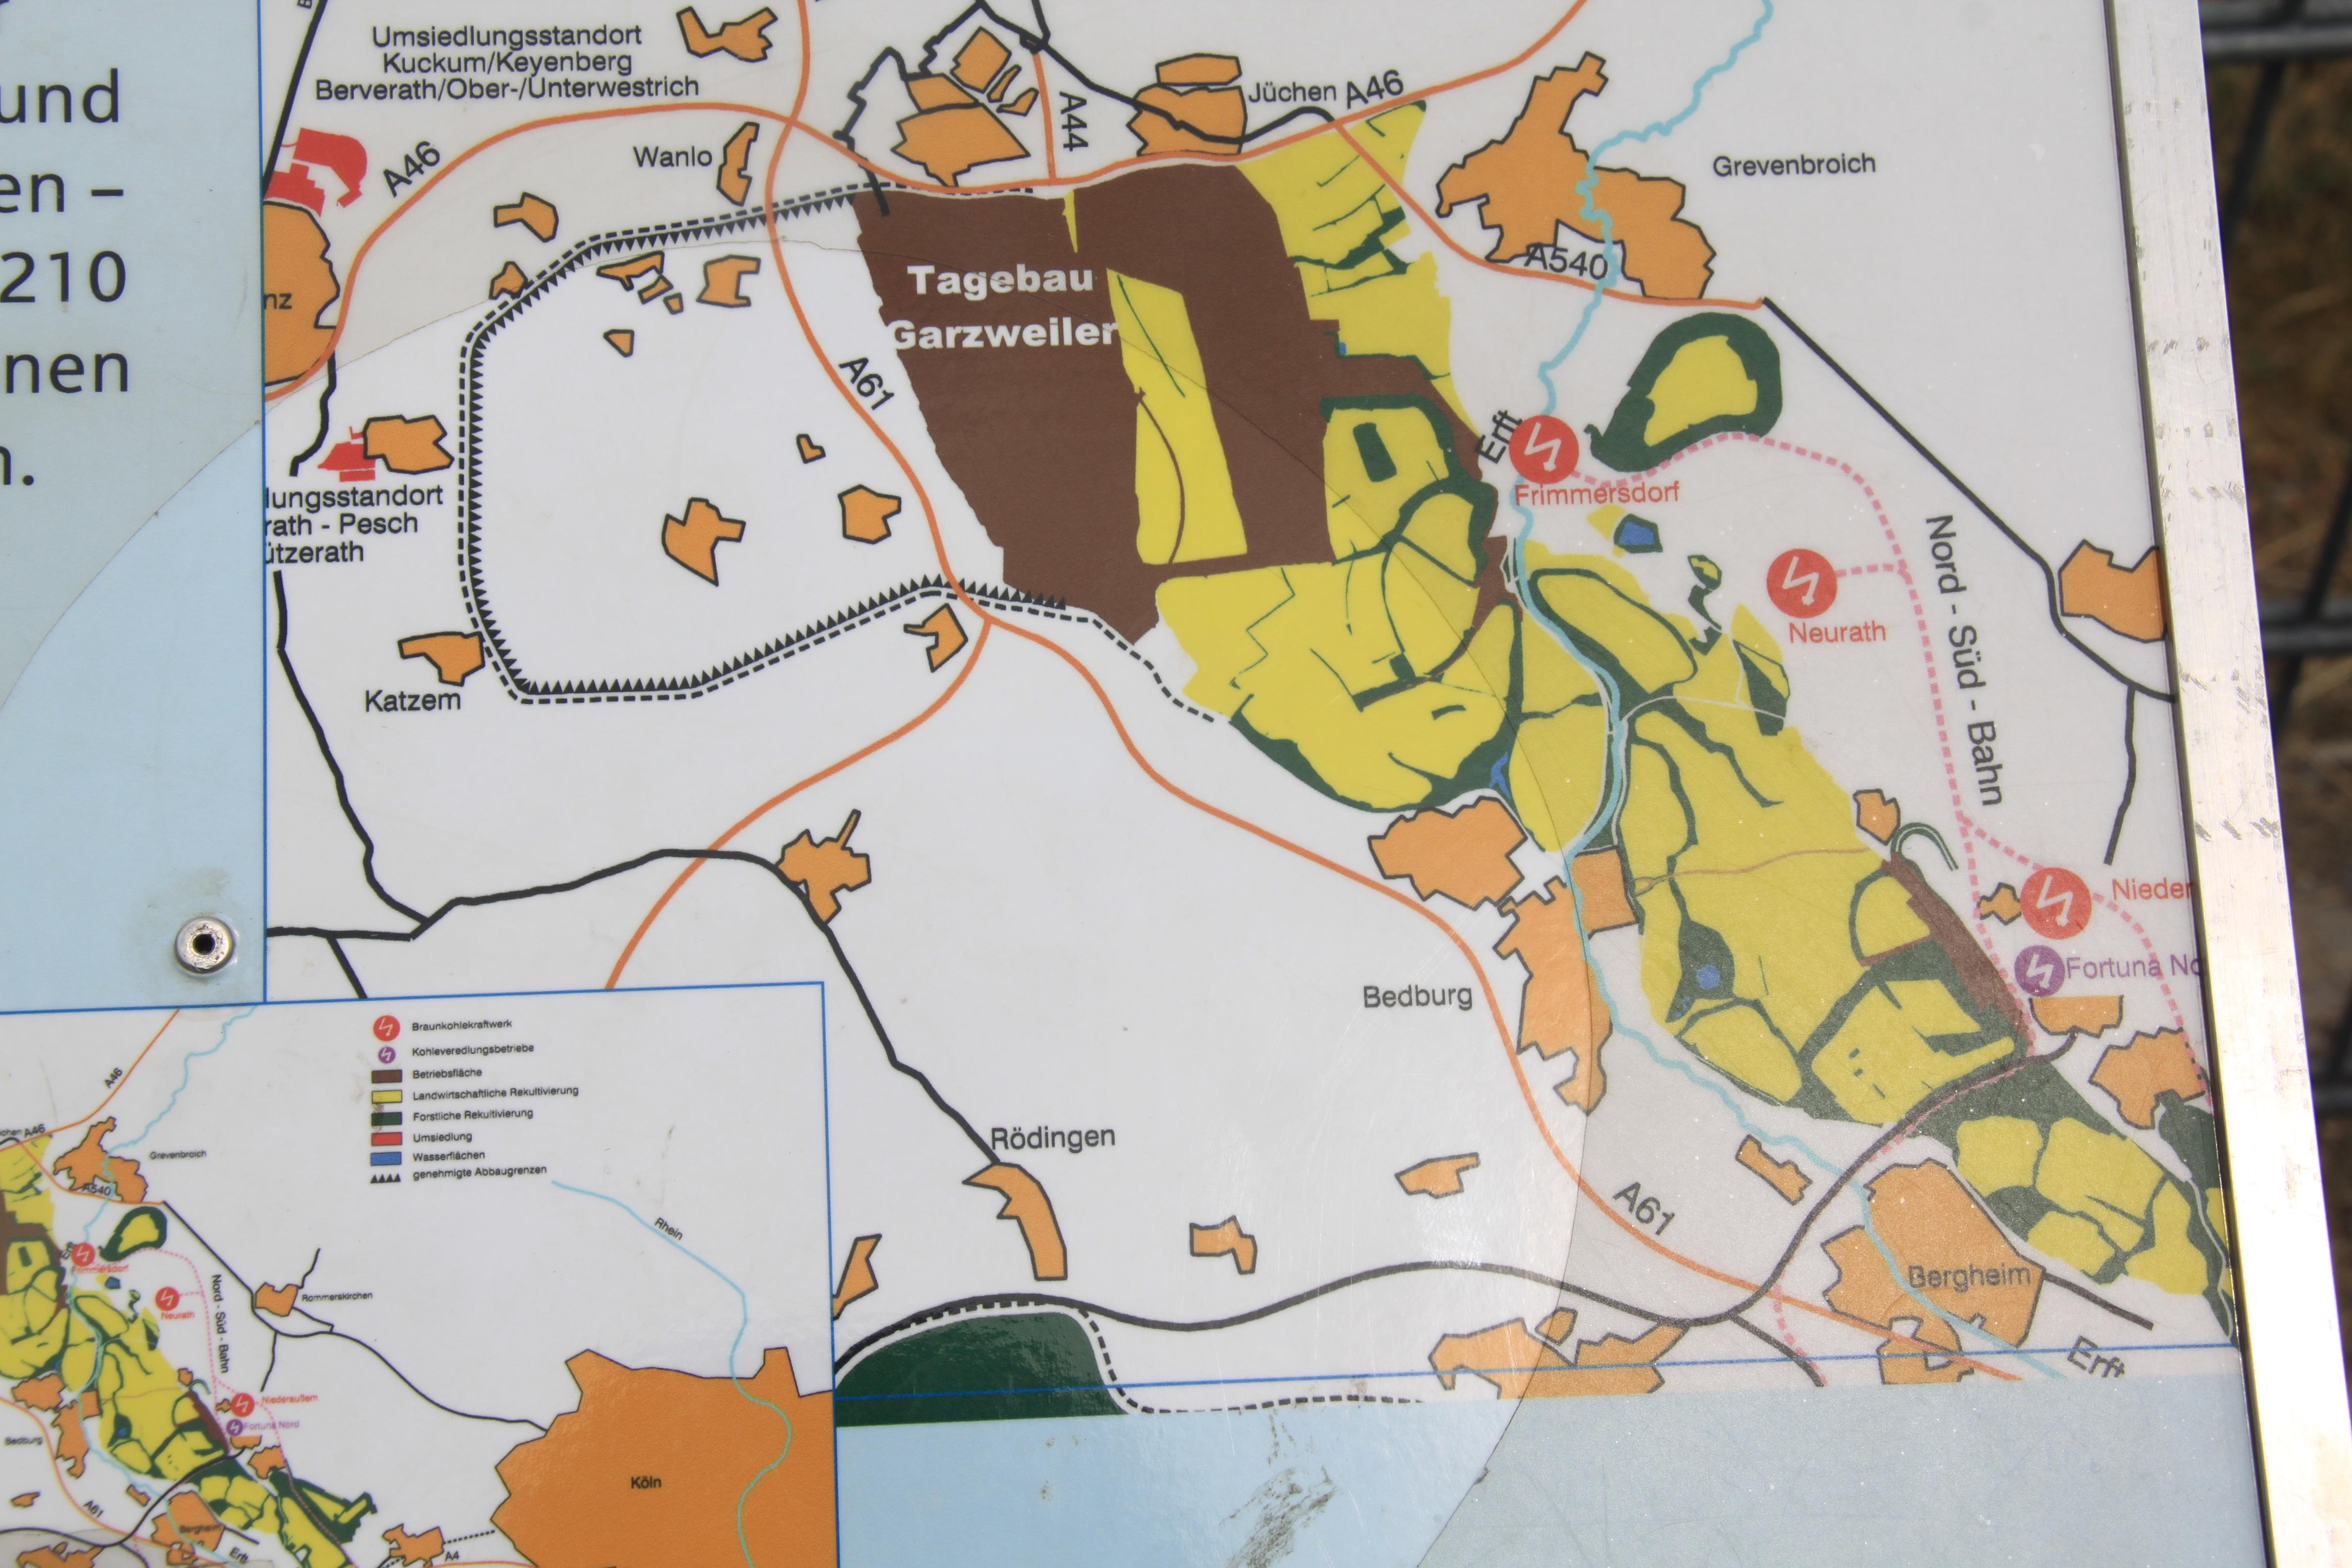 2017-06-25 - 04 - HCC bezoekt Bruinkoolafgraving Garzweiler